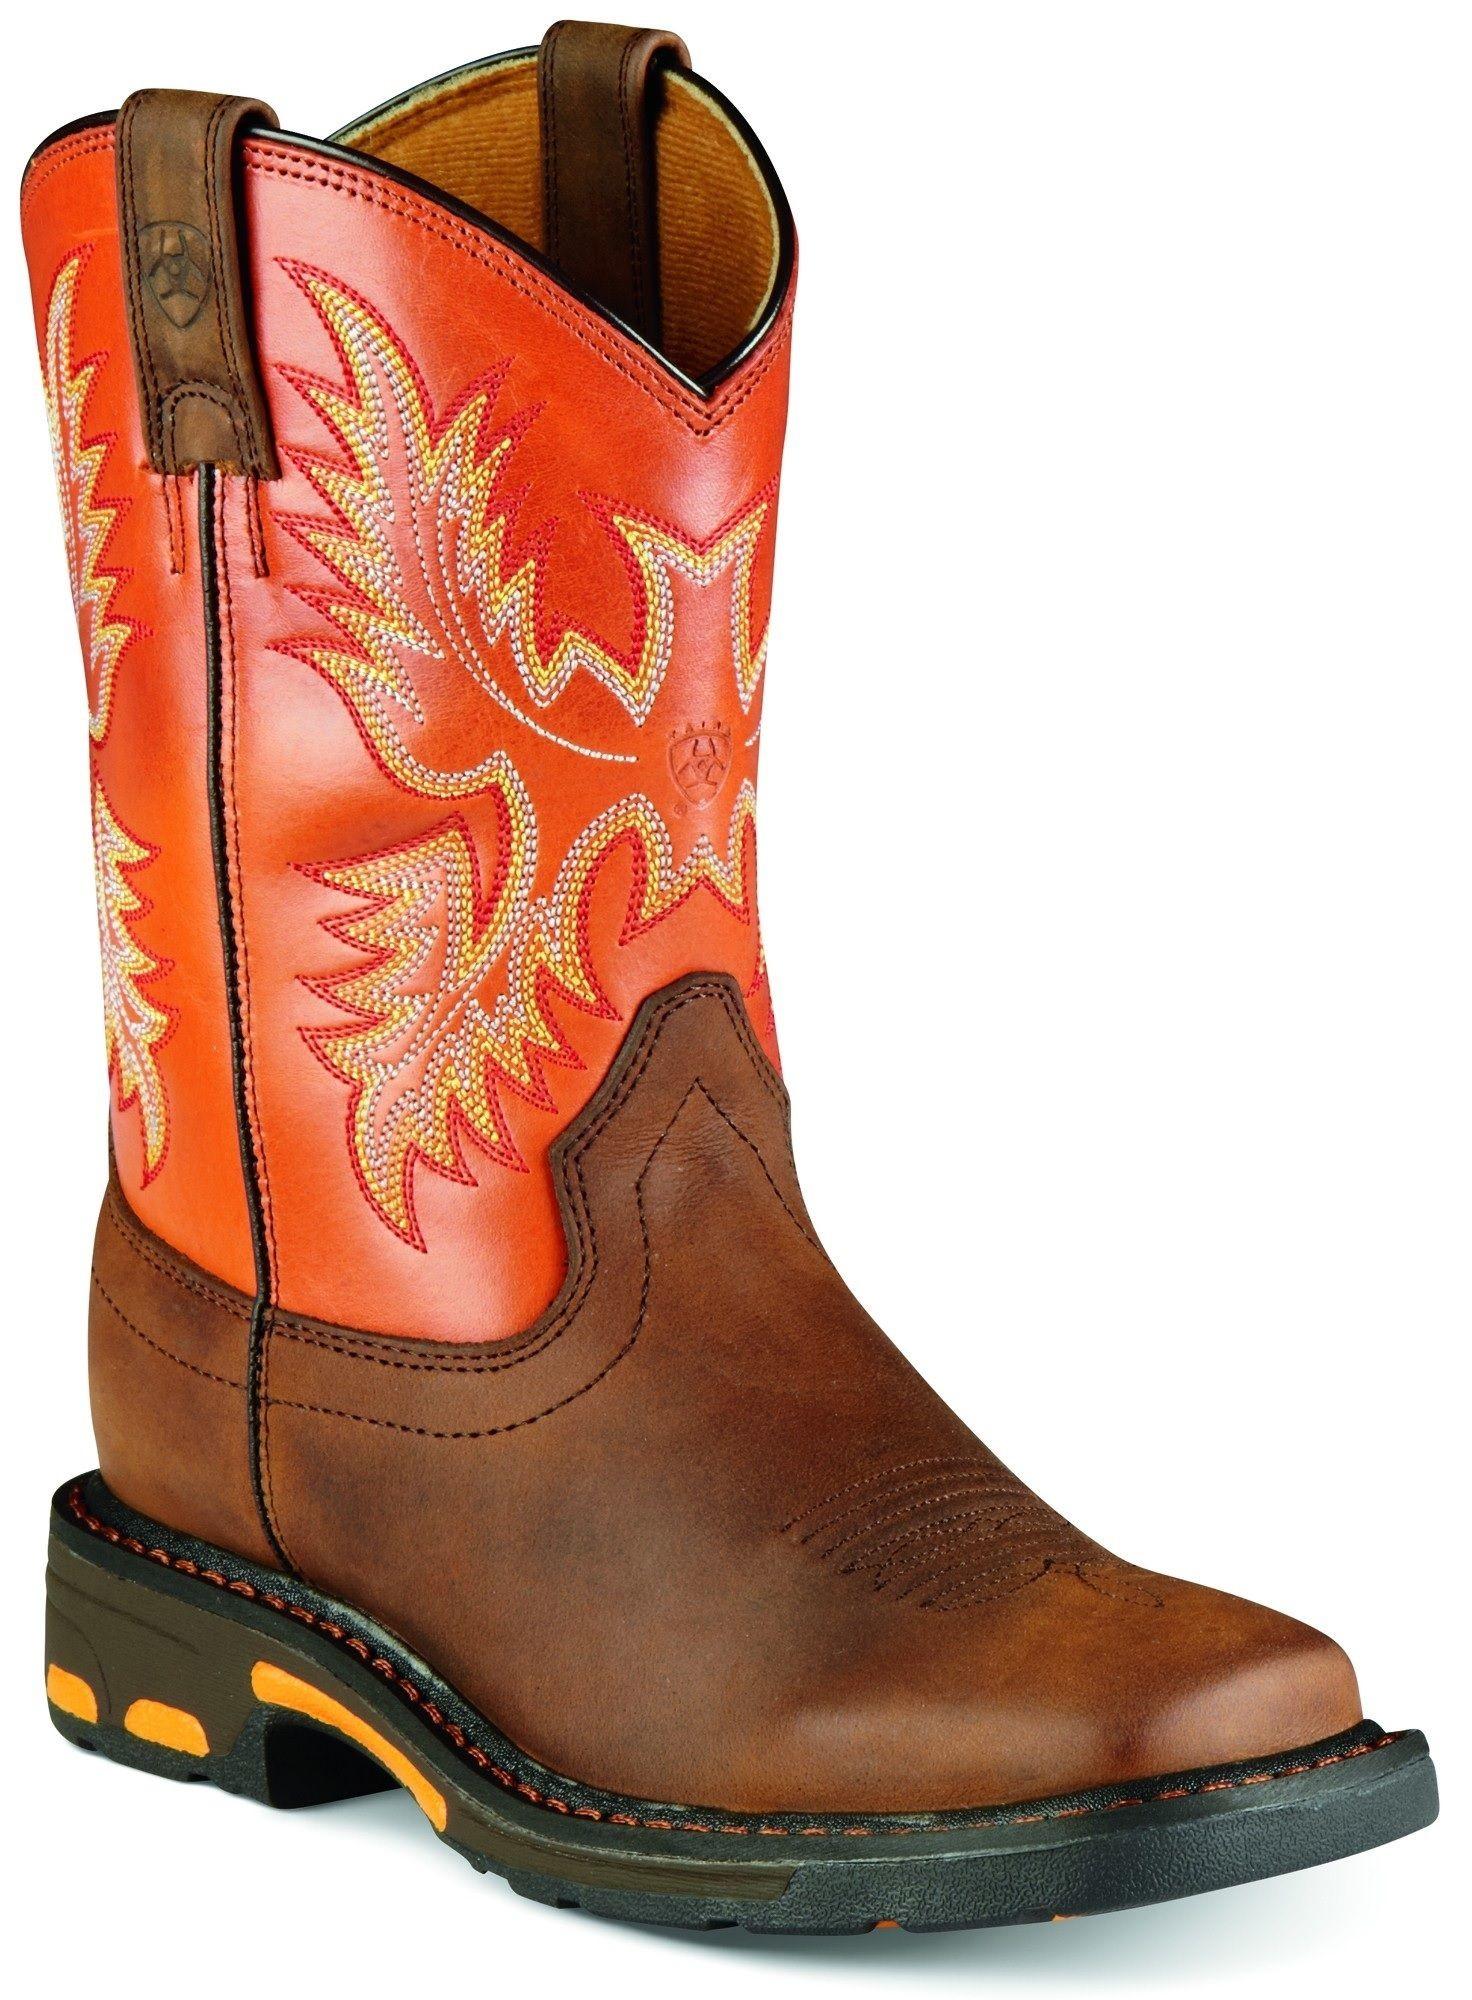 Boys' Workhog Pull-On Square Toe Cowboy